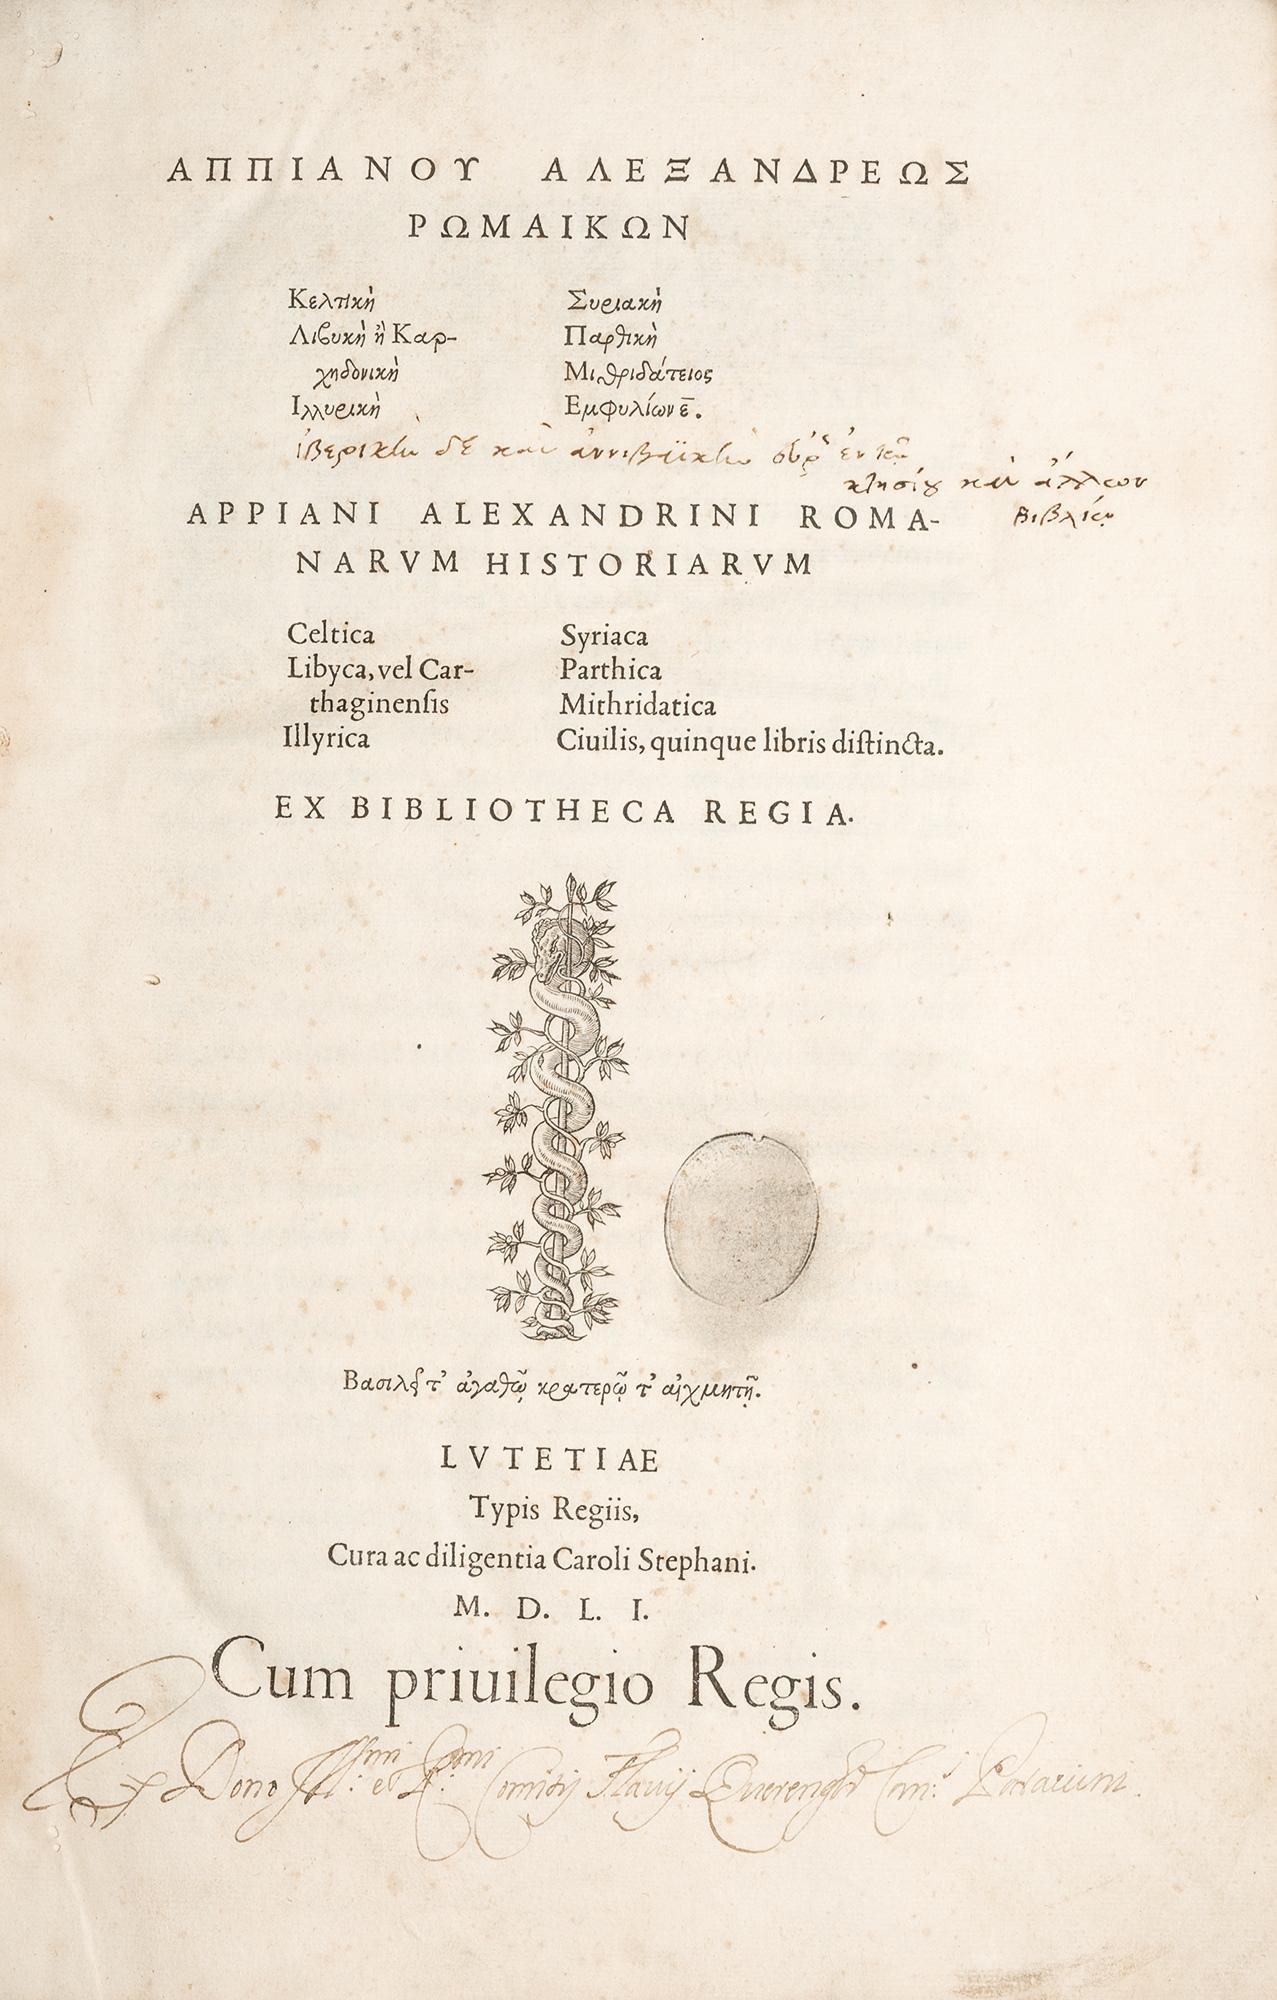 Appiani Alexandrini Romanorum historiarum